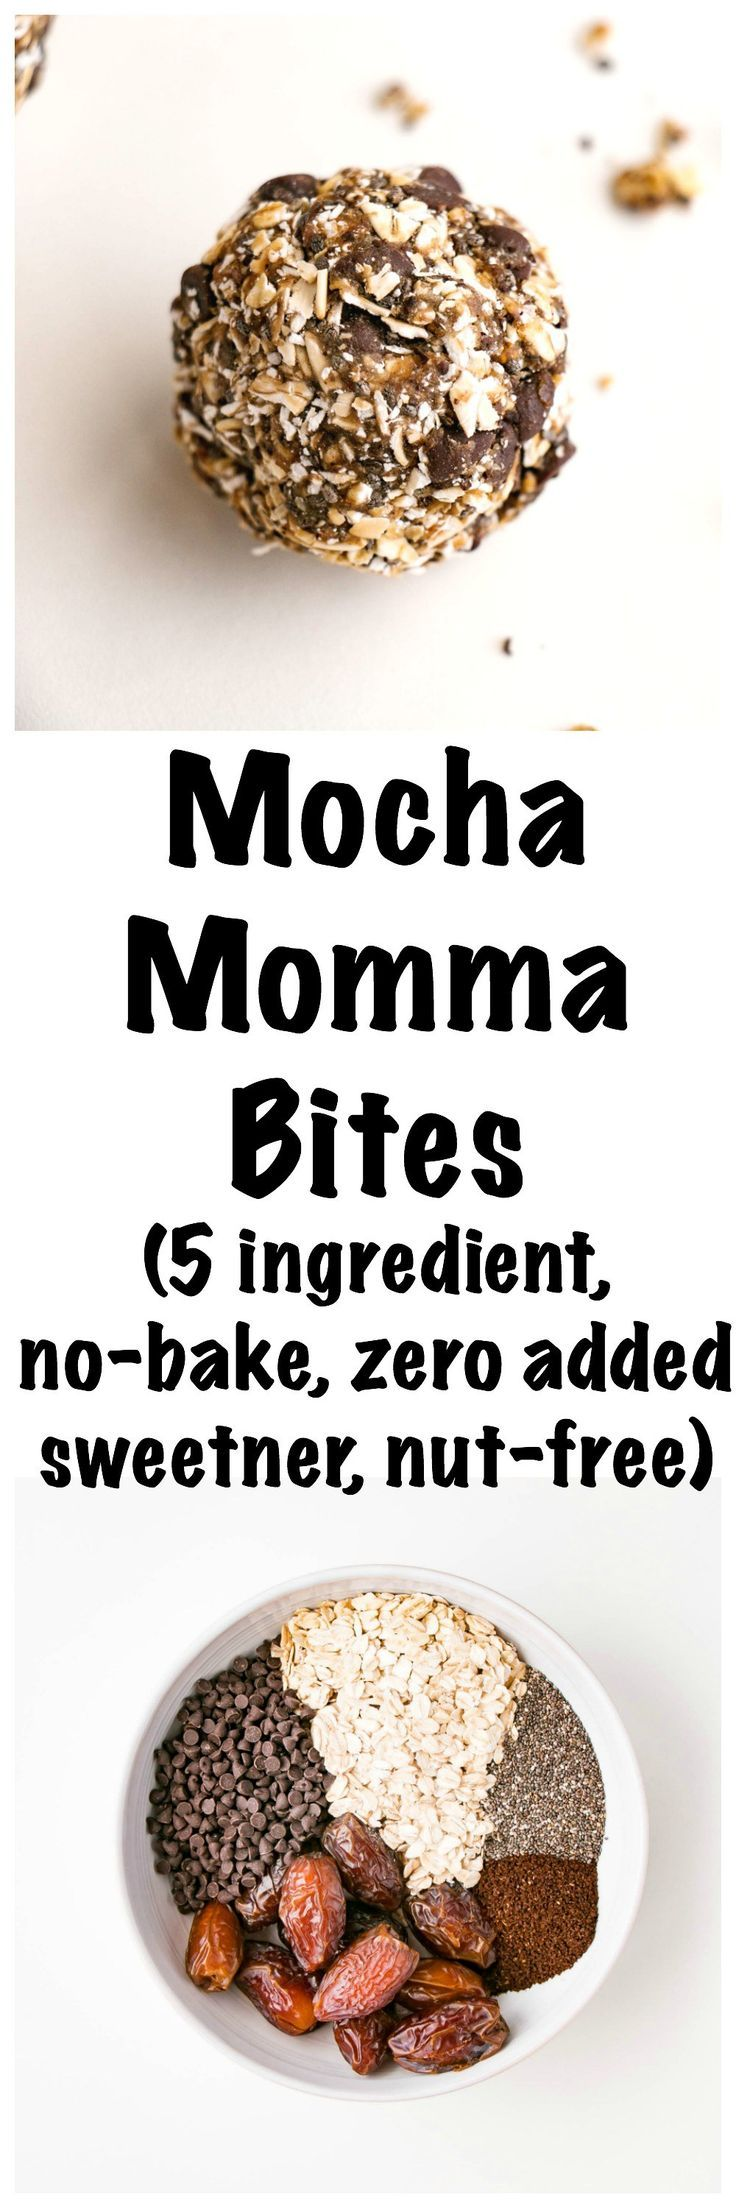 Mocha Momma Bite | My Kitchen Love